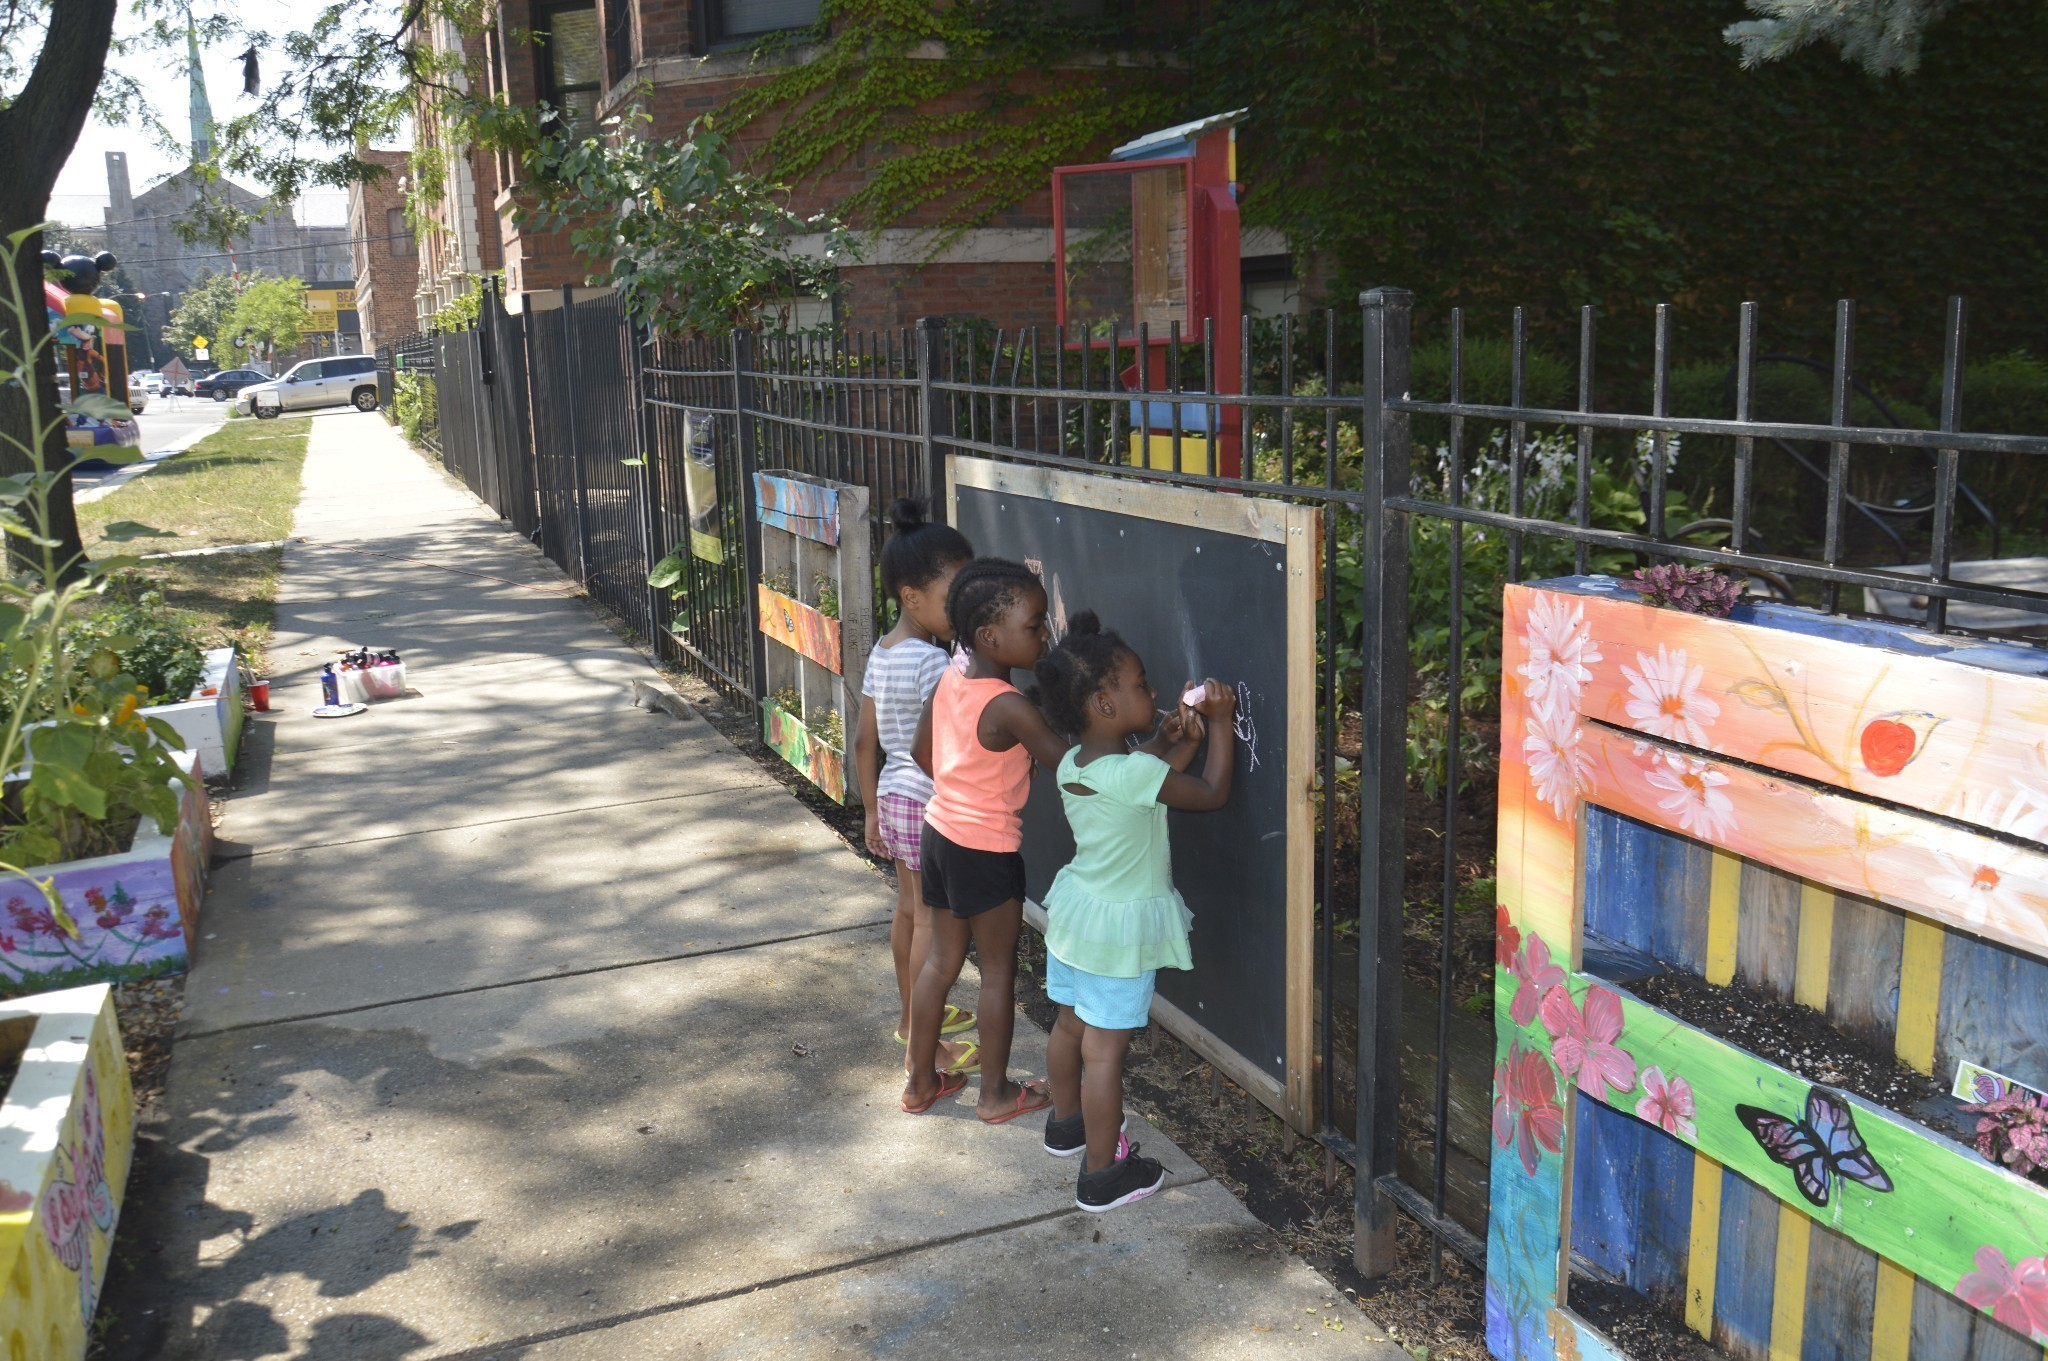 How community gardens and block associations help stem urban violence